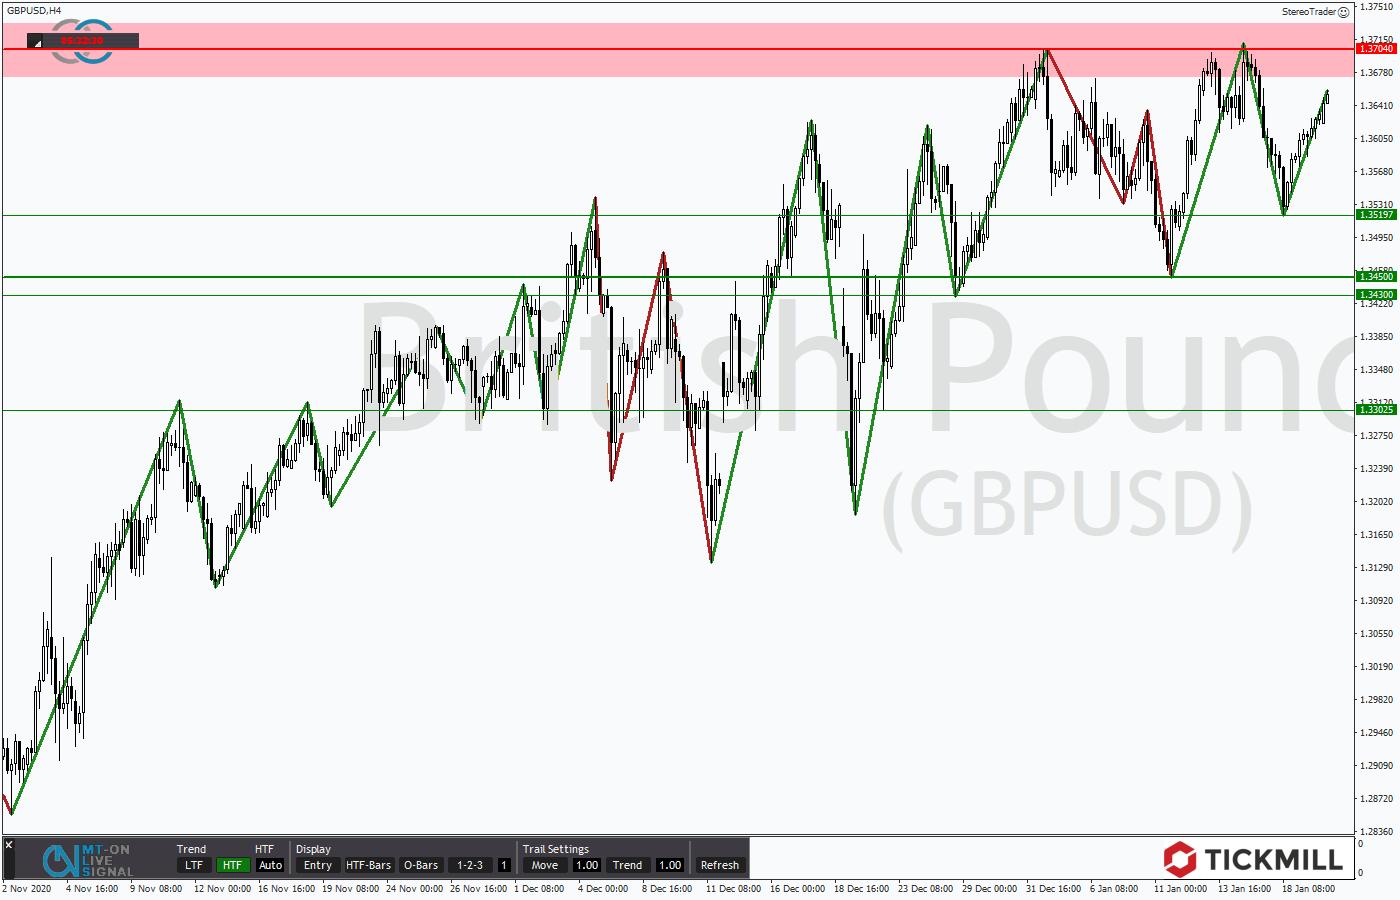 Tickmill-Analyse: GBPUSD im 4-Stundenchart